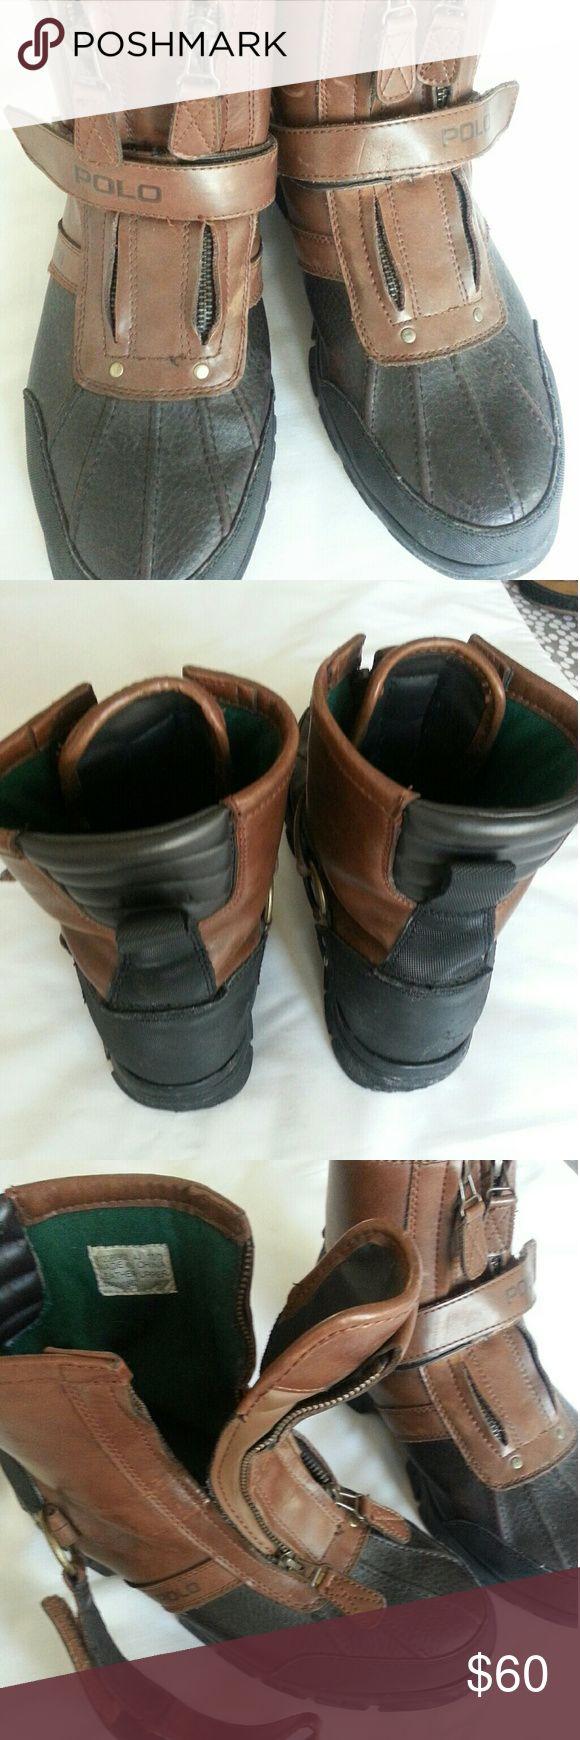 Men size 10 polo boots Polo boots polo Shoes Boots